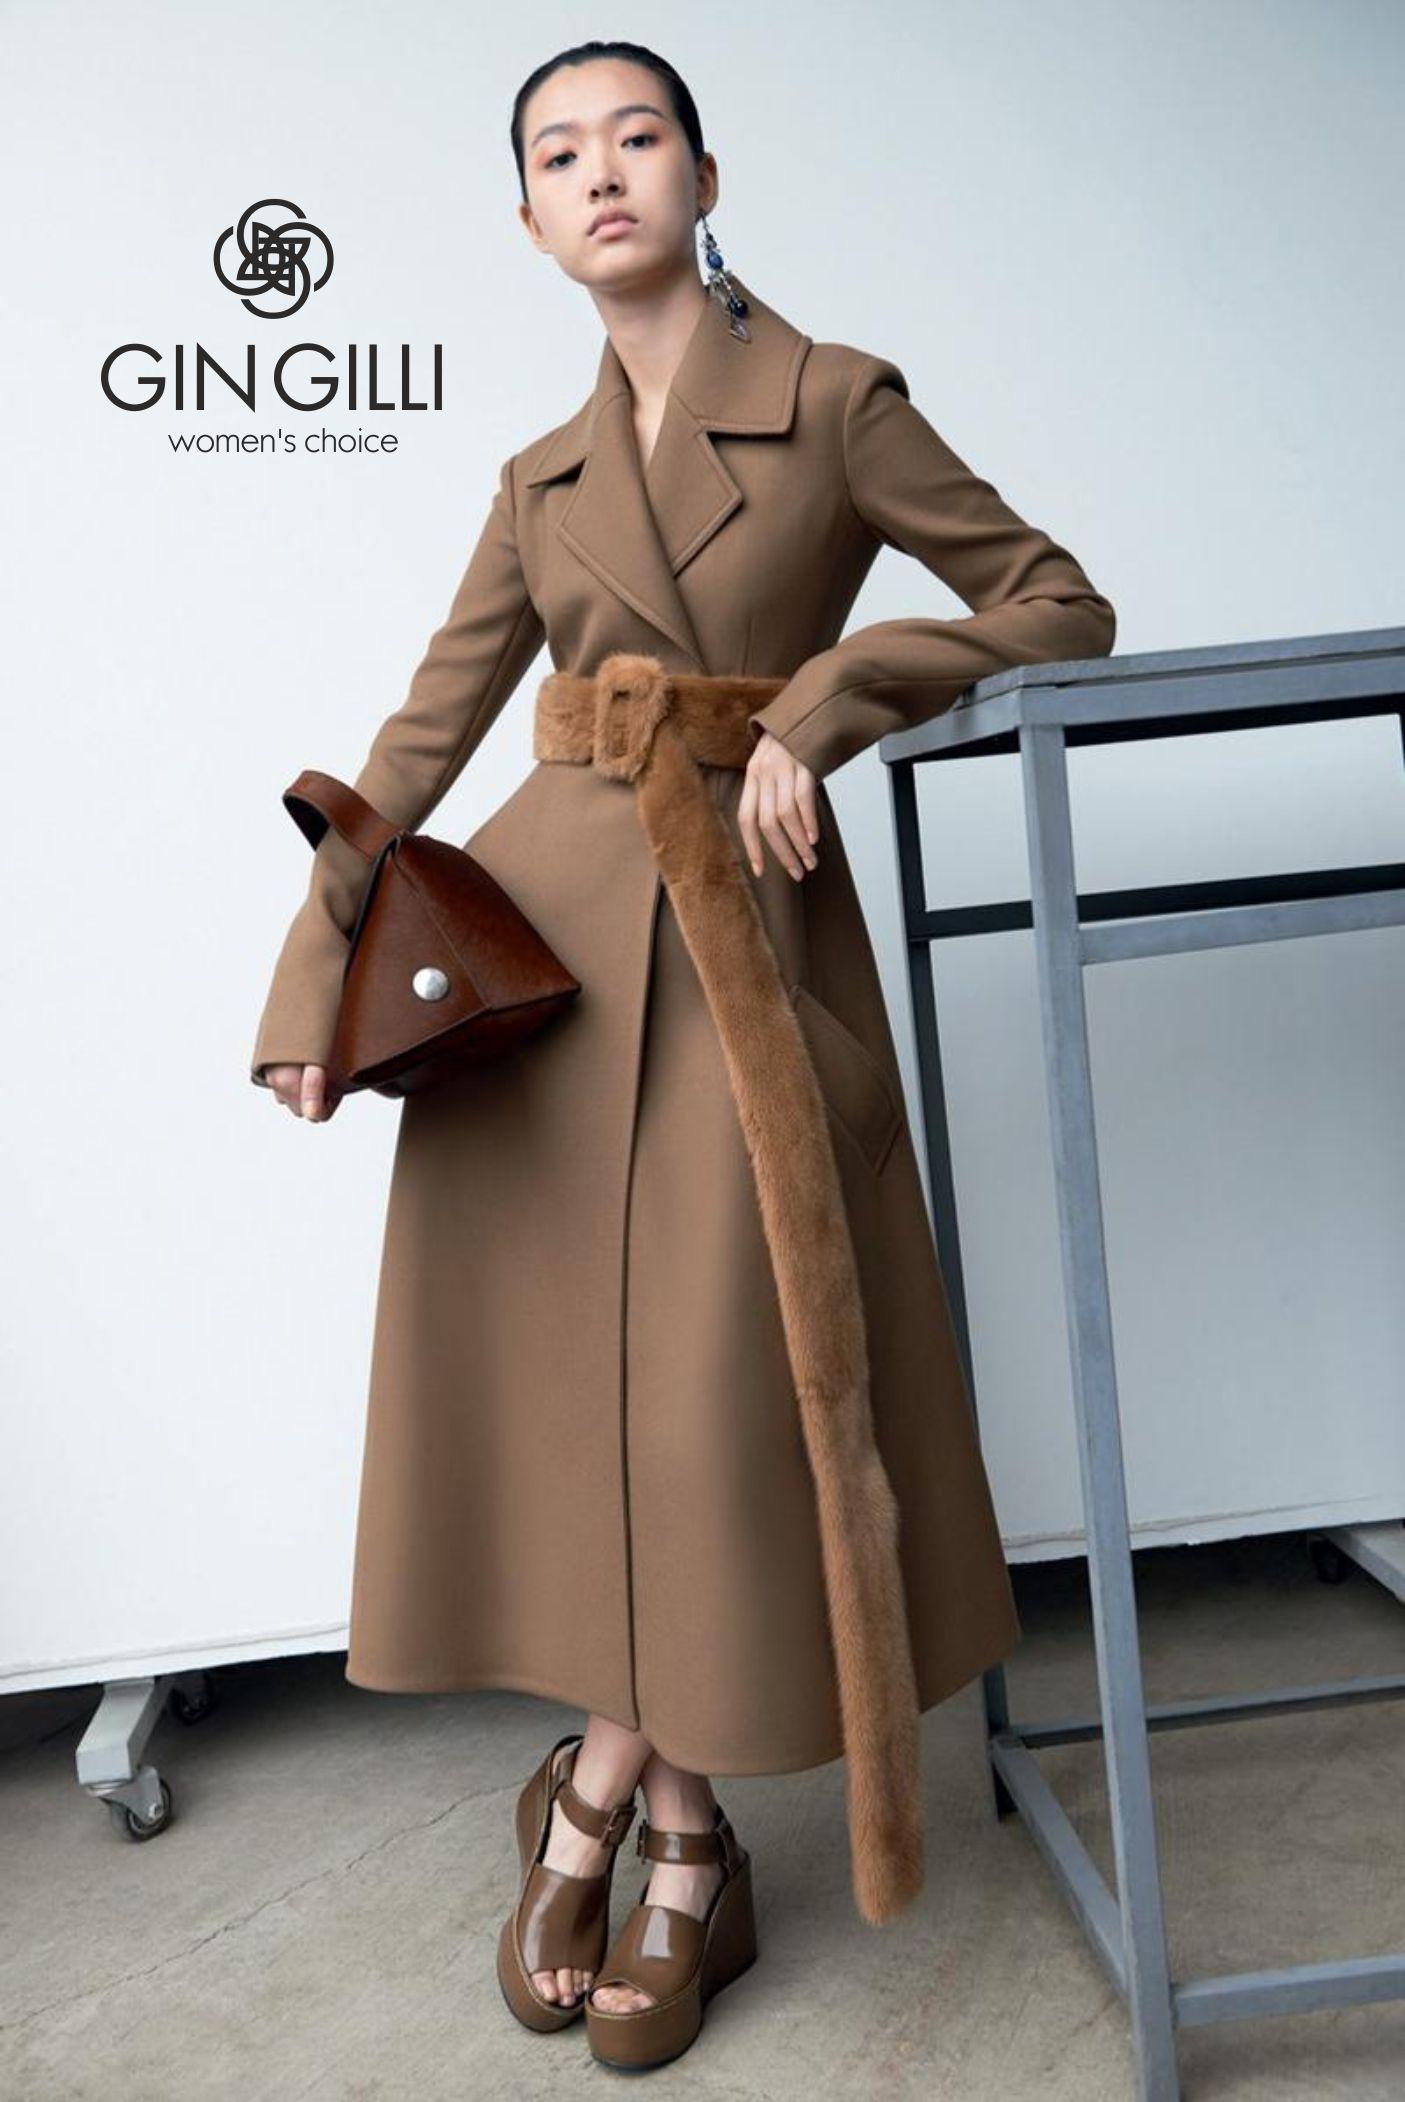 FASHION BRAND/ Разработка фирменного стиля для женской одежд фото f_5365a29336e30938.jpg